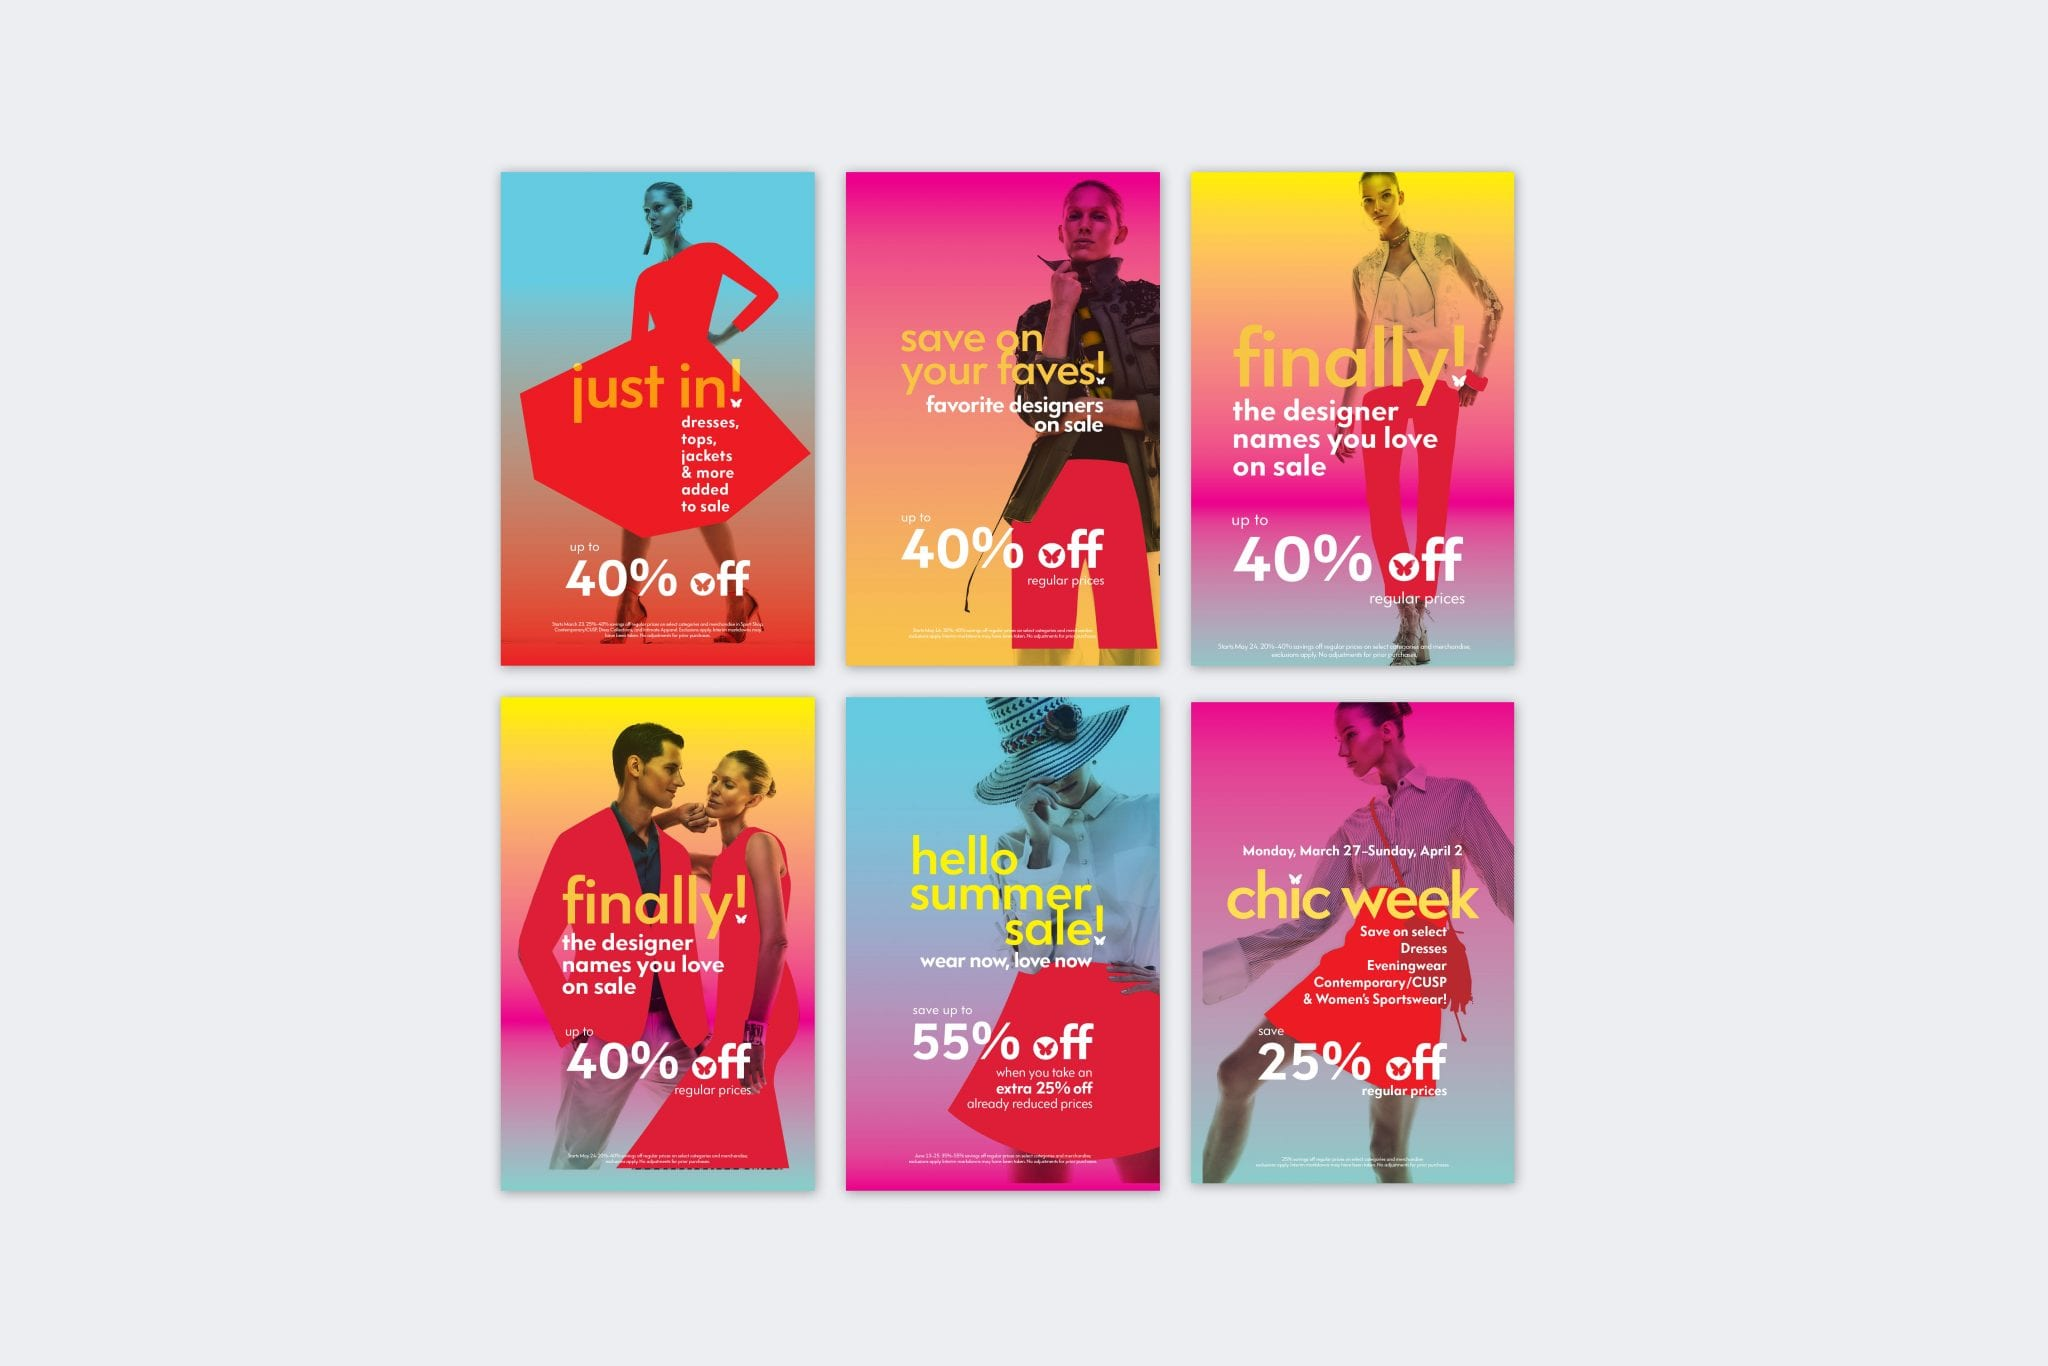 2017 Sale Campaign Image